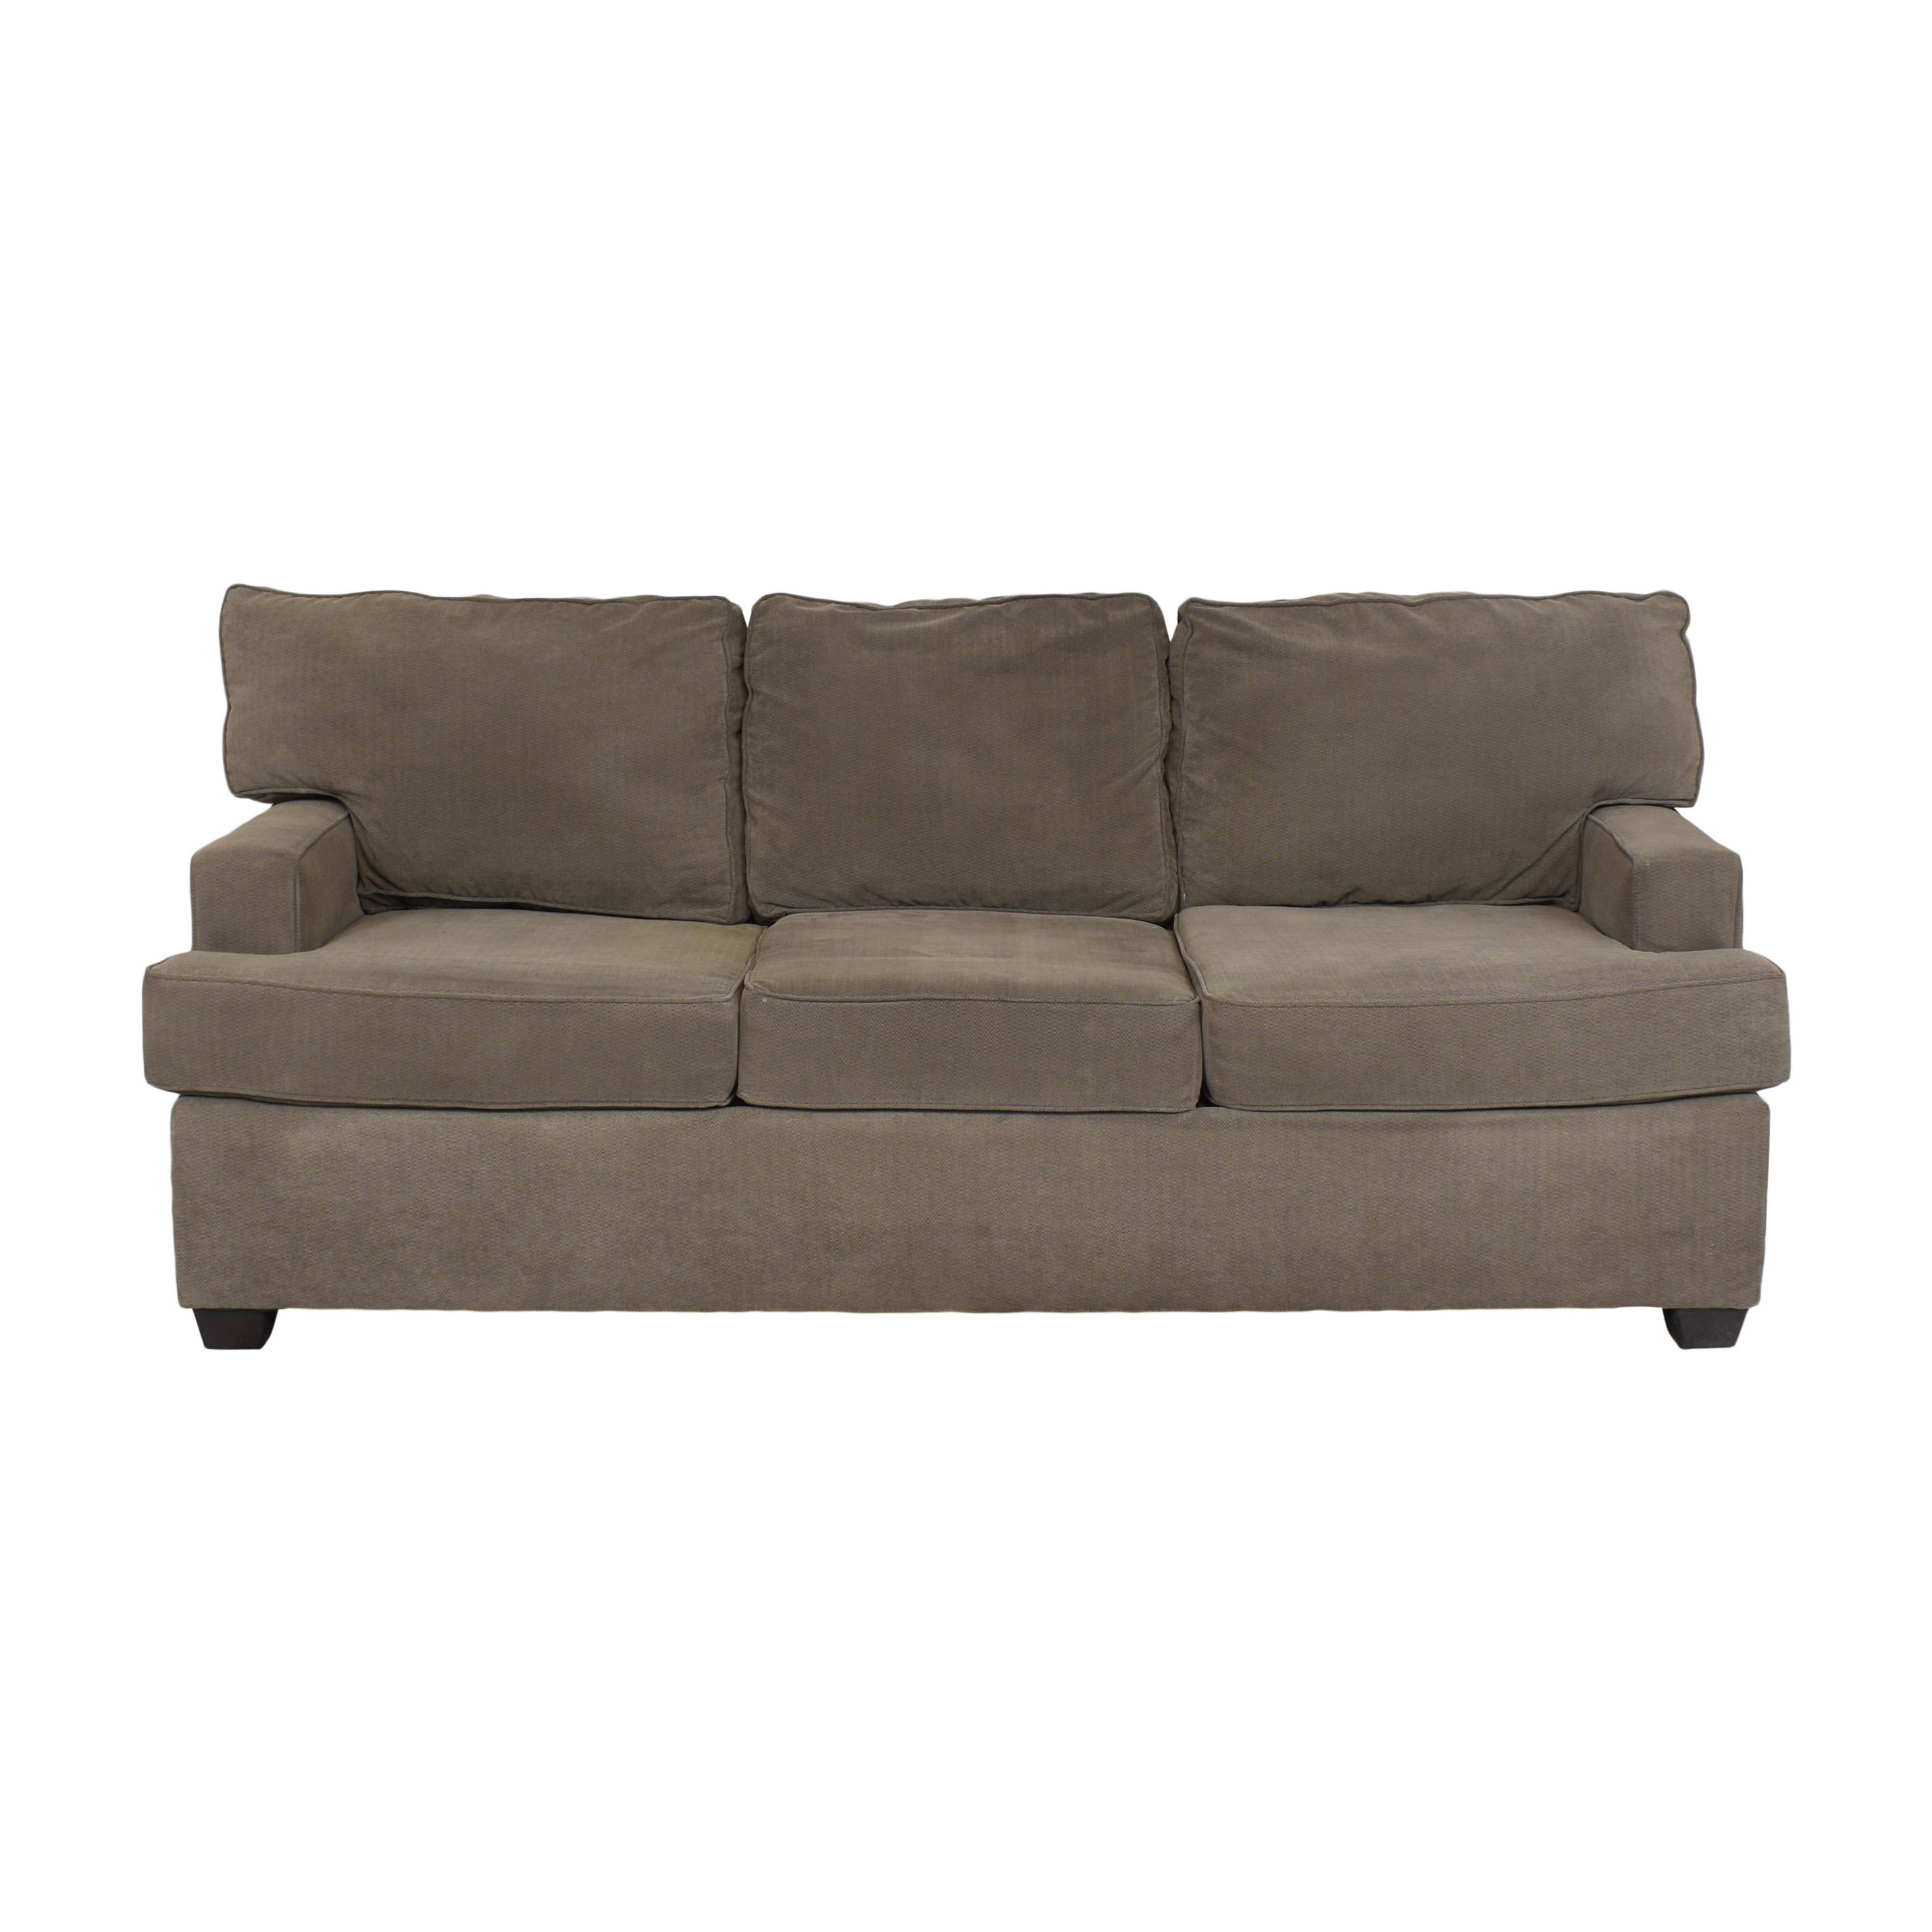 buy Klaussner Cruze Sofa Klaussner